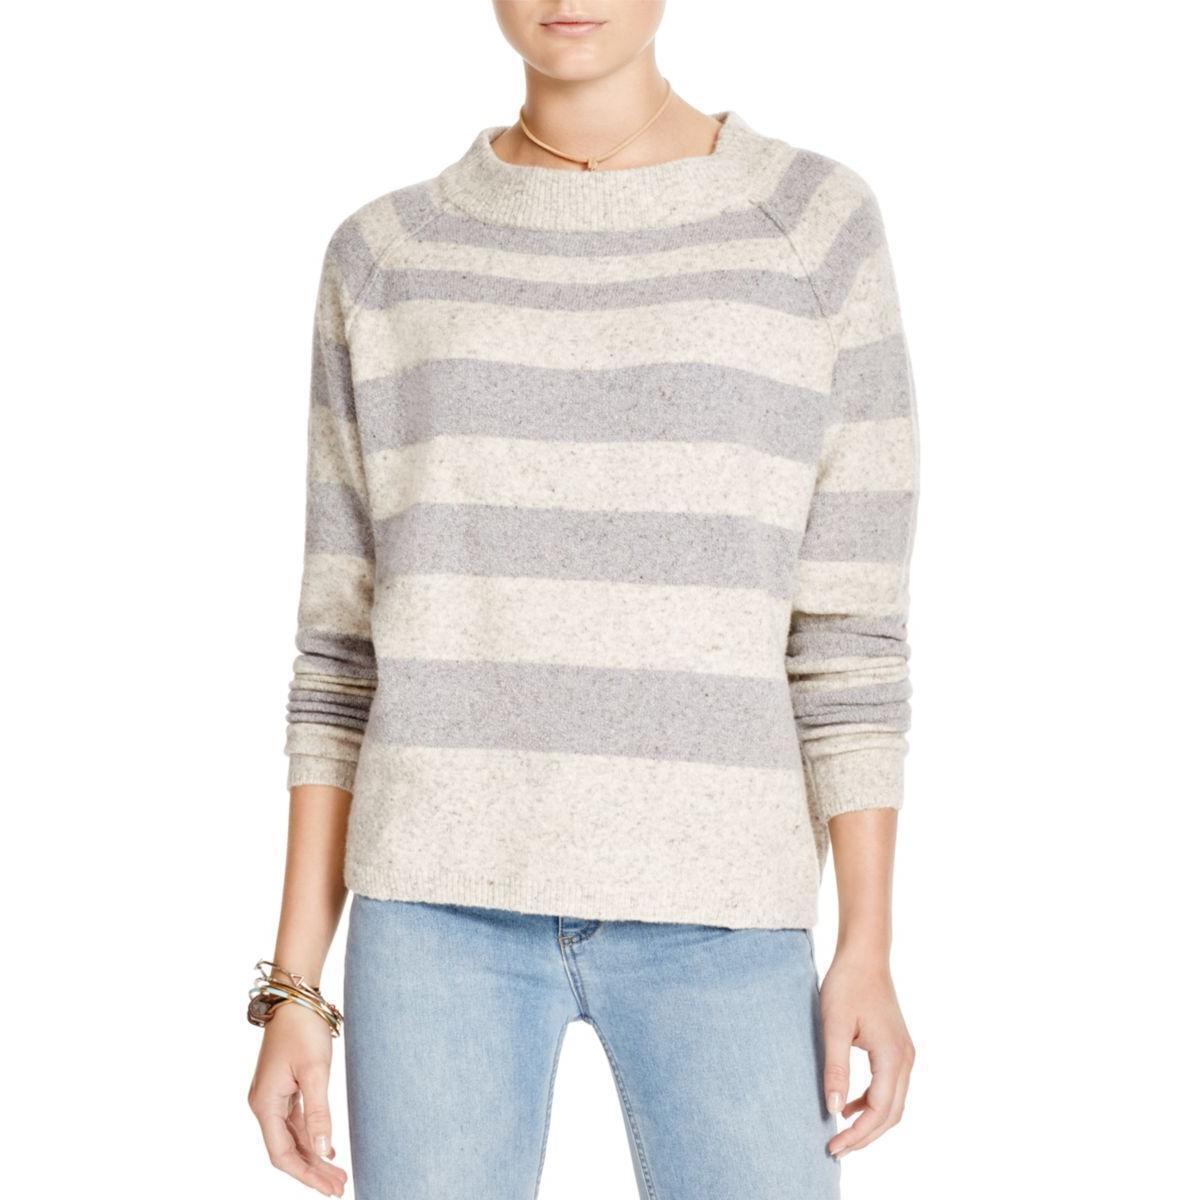 Free People Striped Crop Sweater wool Blend Ivory Grey  118 Medium NWT